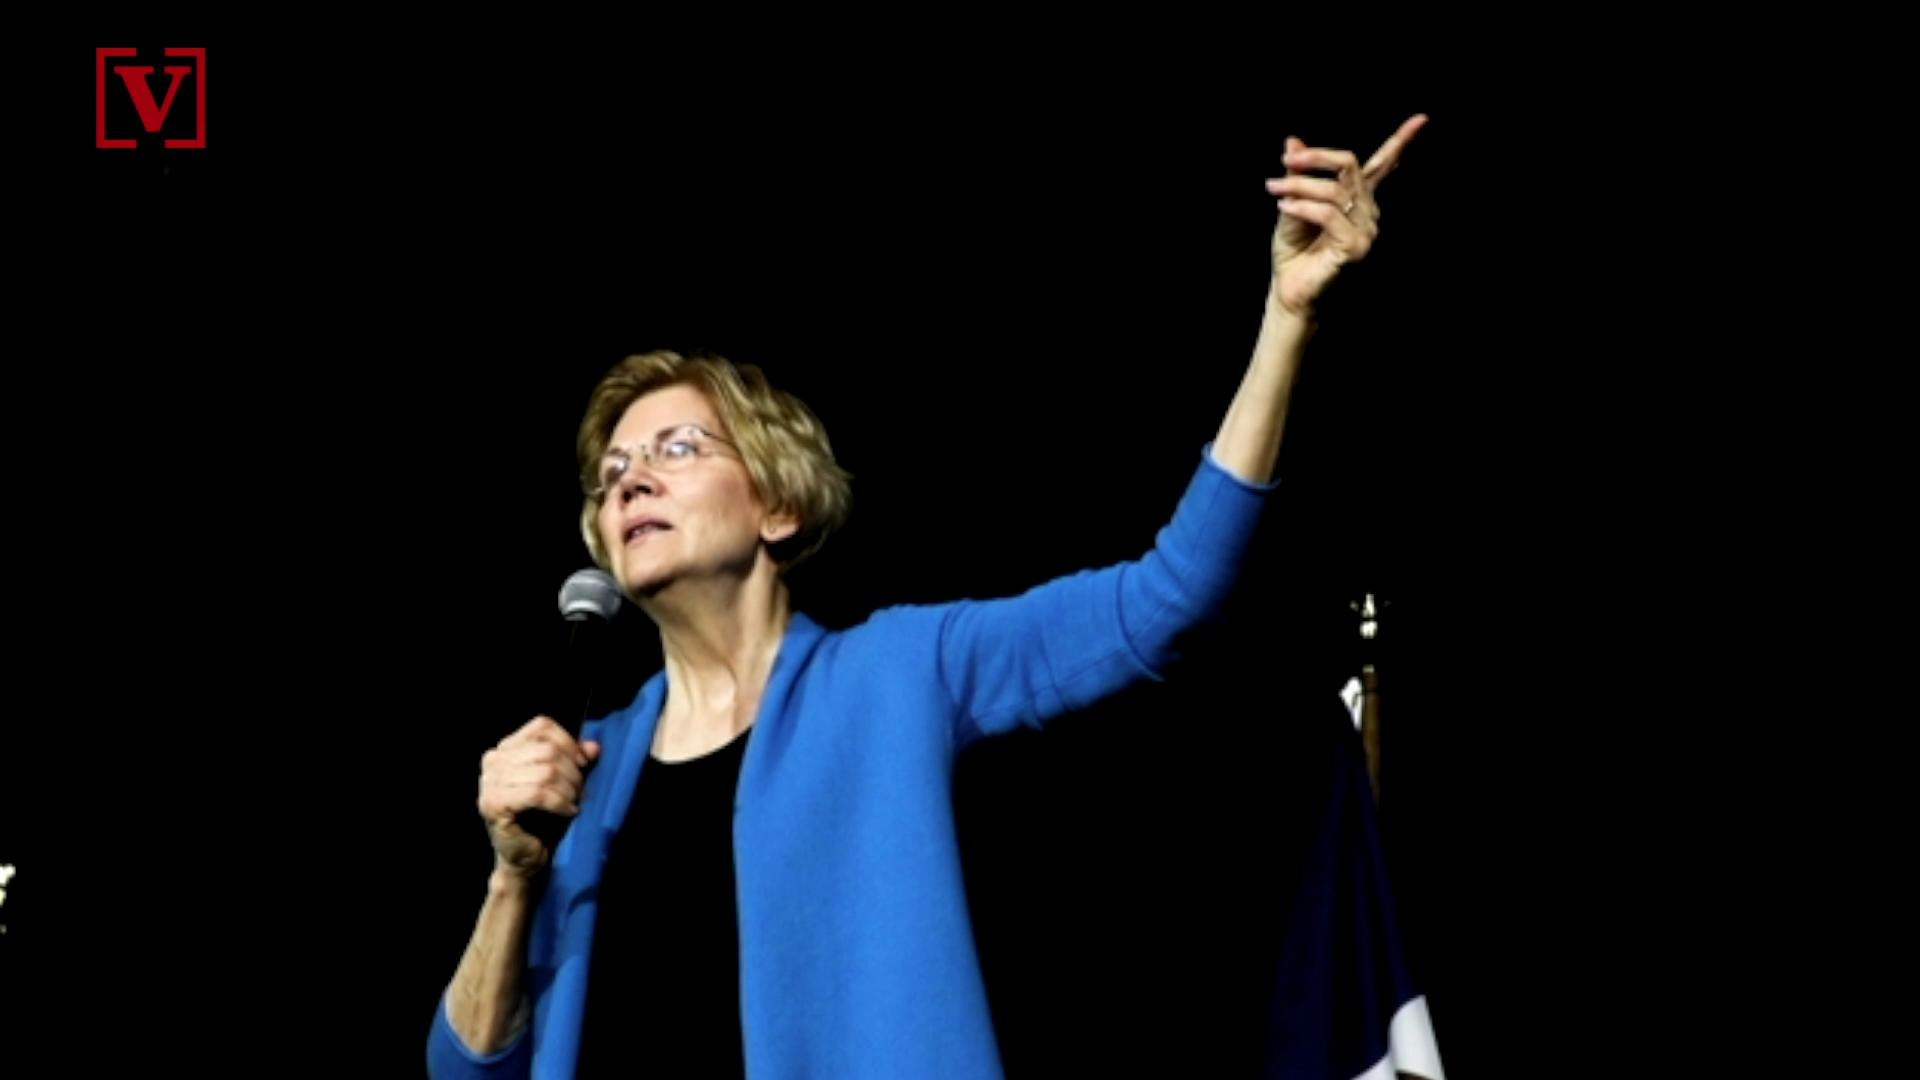 Elizabeth Warren's Ads Targeting Facebook & Big Tech Temporarily Yanked by Facebook